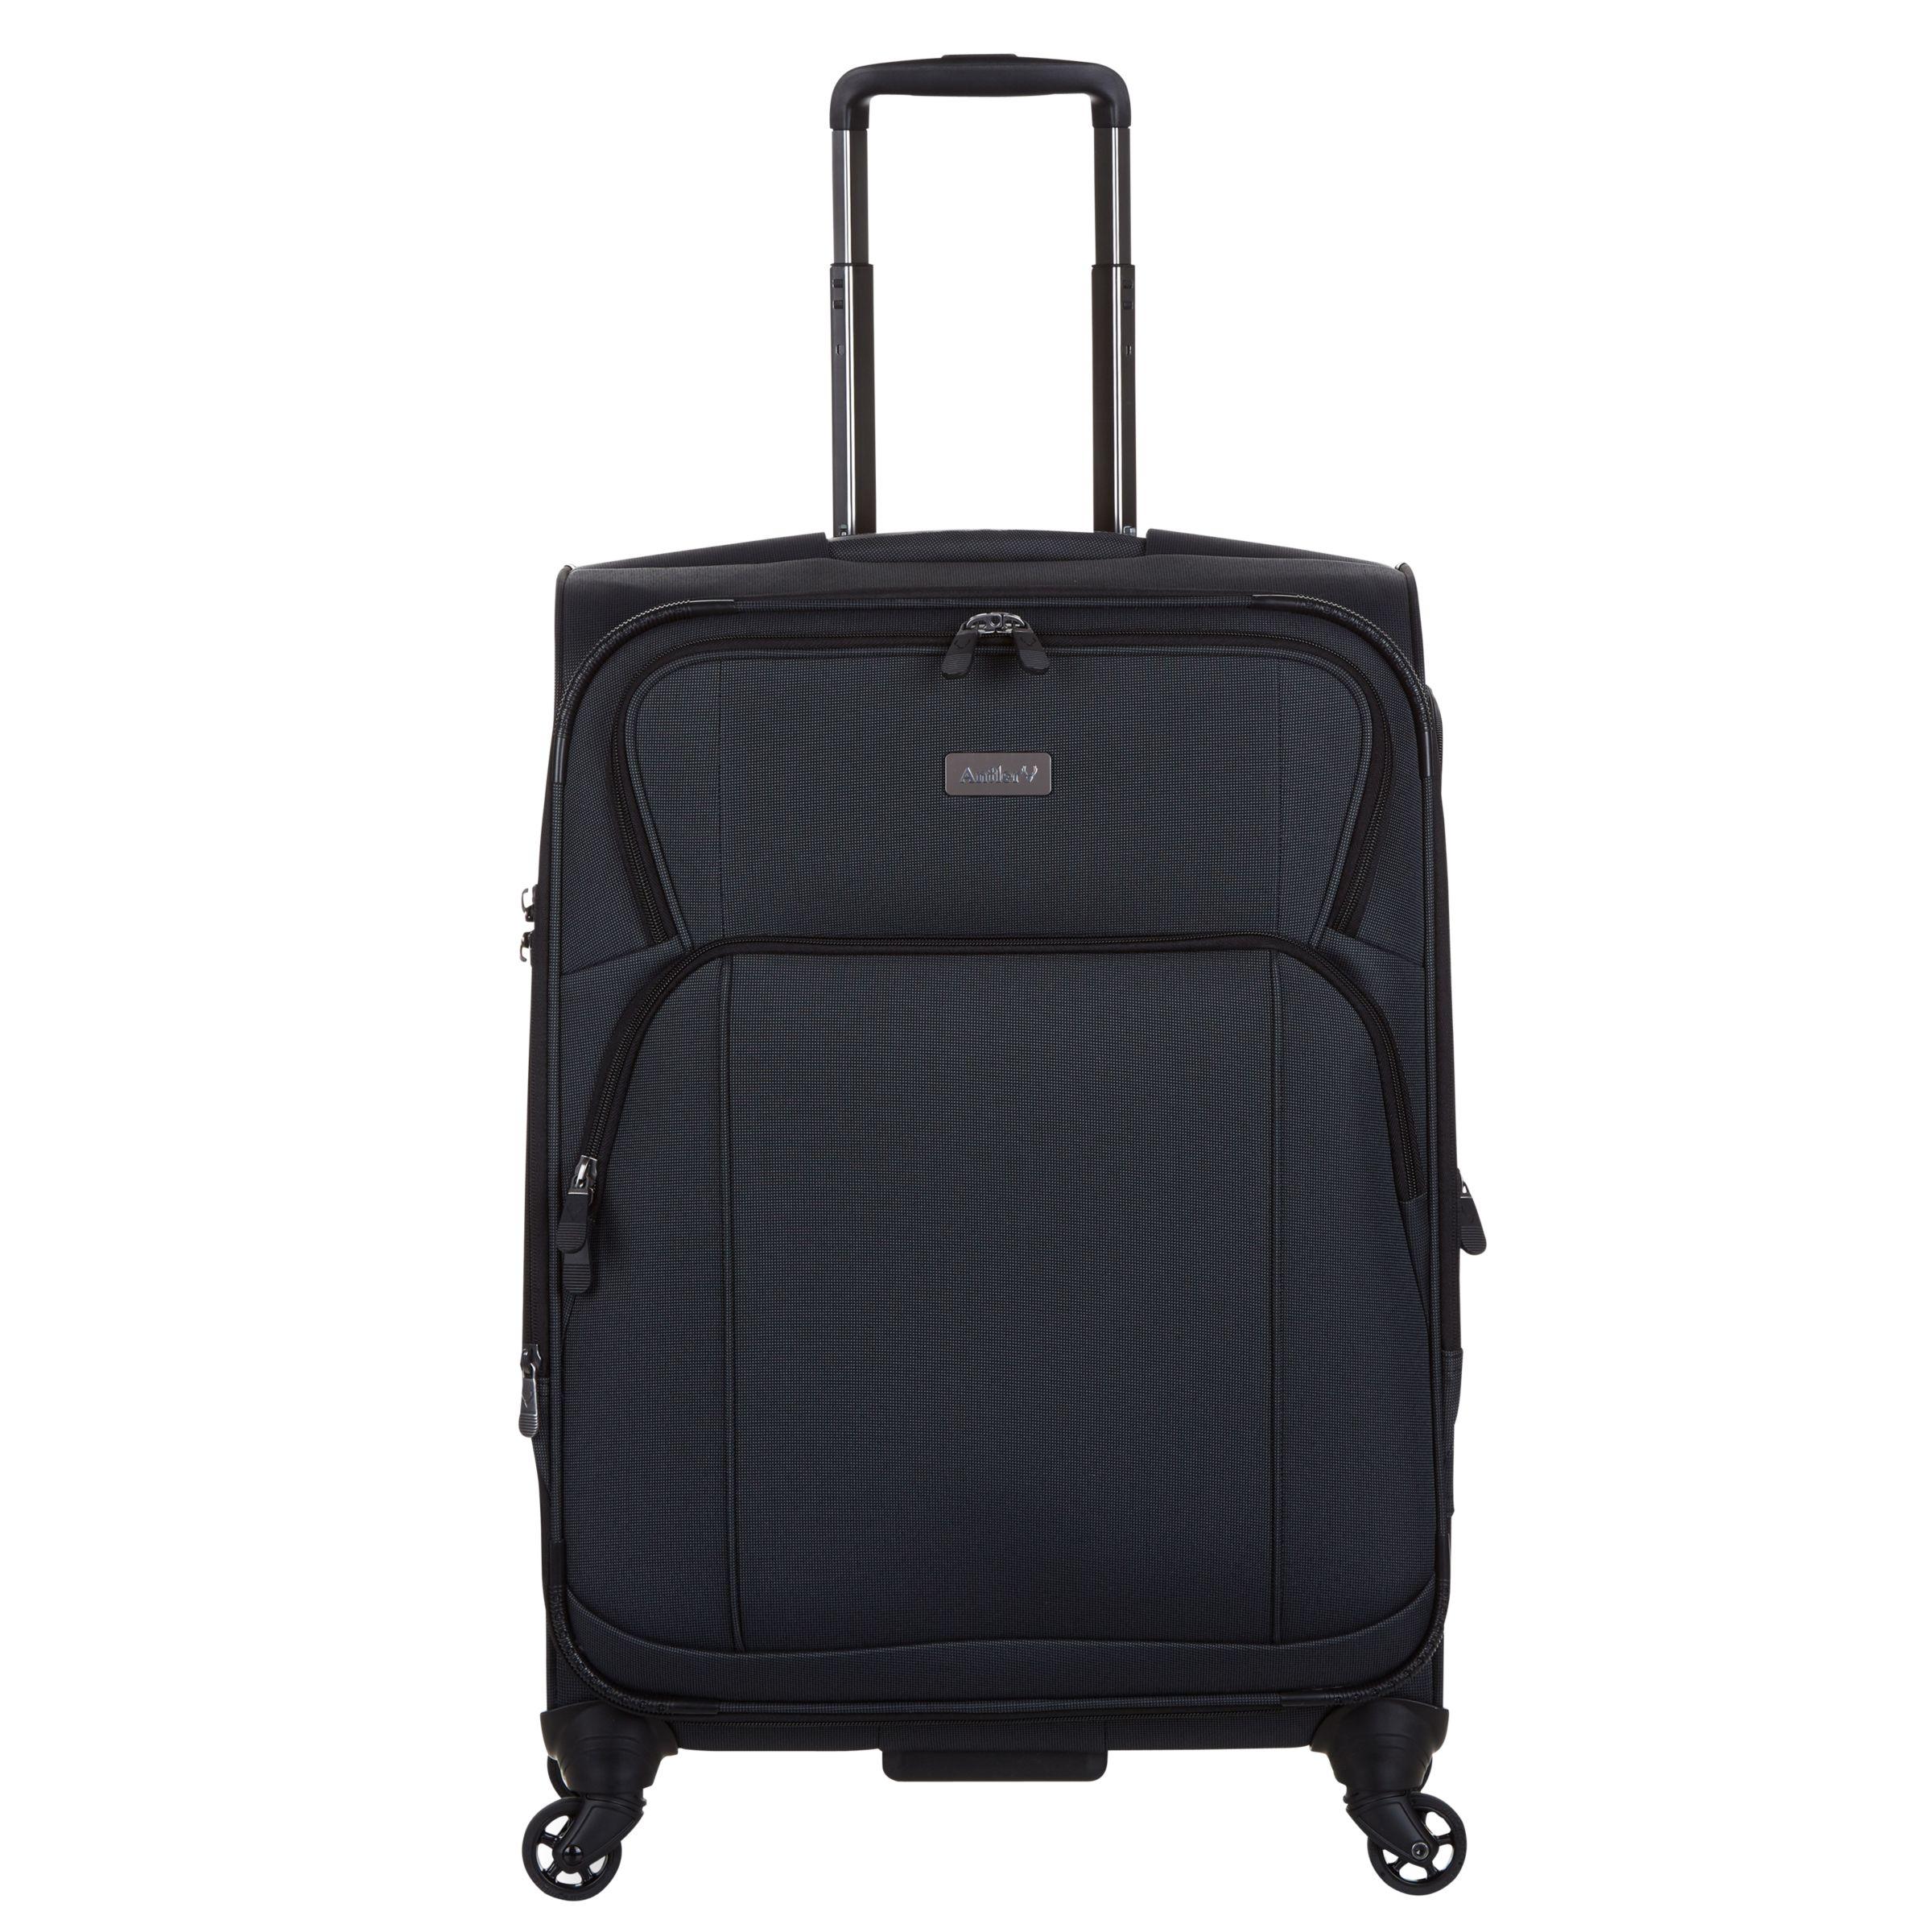 Antler Antler Airstreamii 66cm 4-Wheel Suitcase, Charcoal